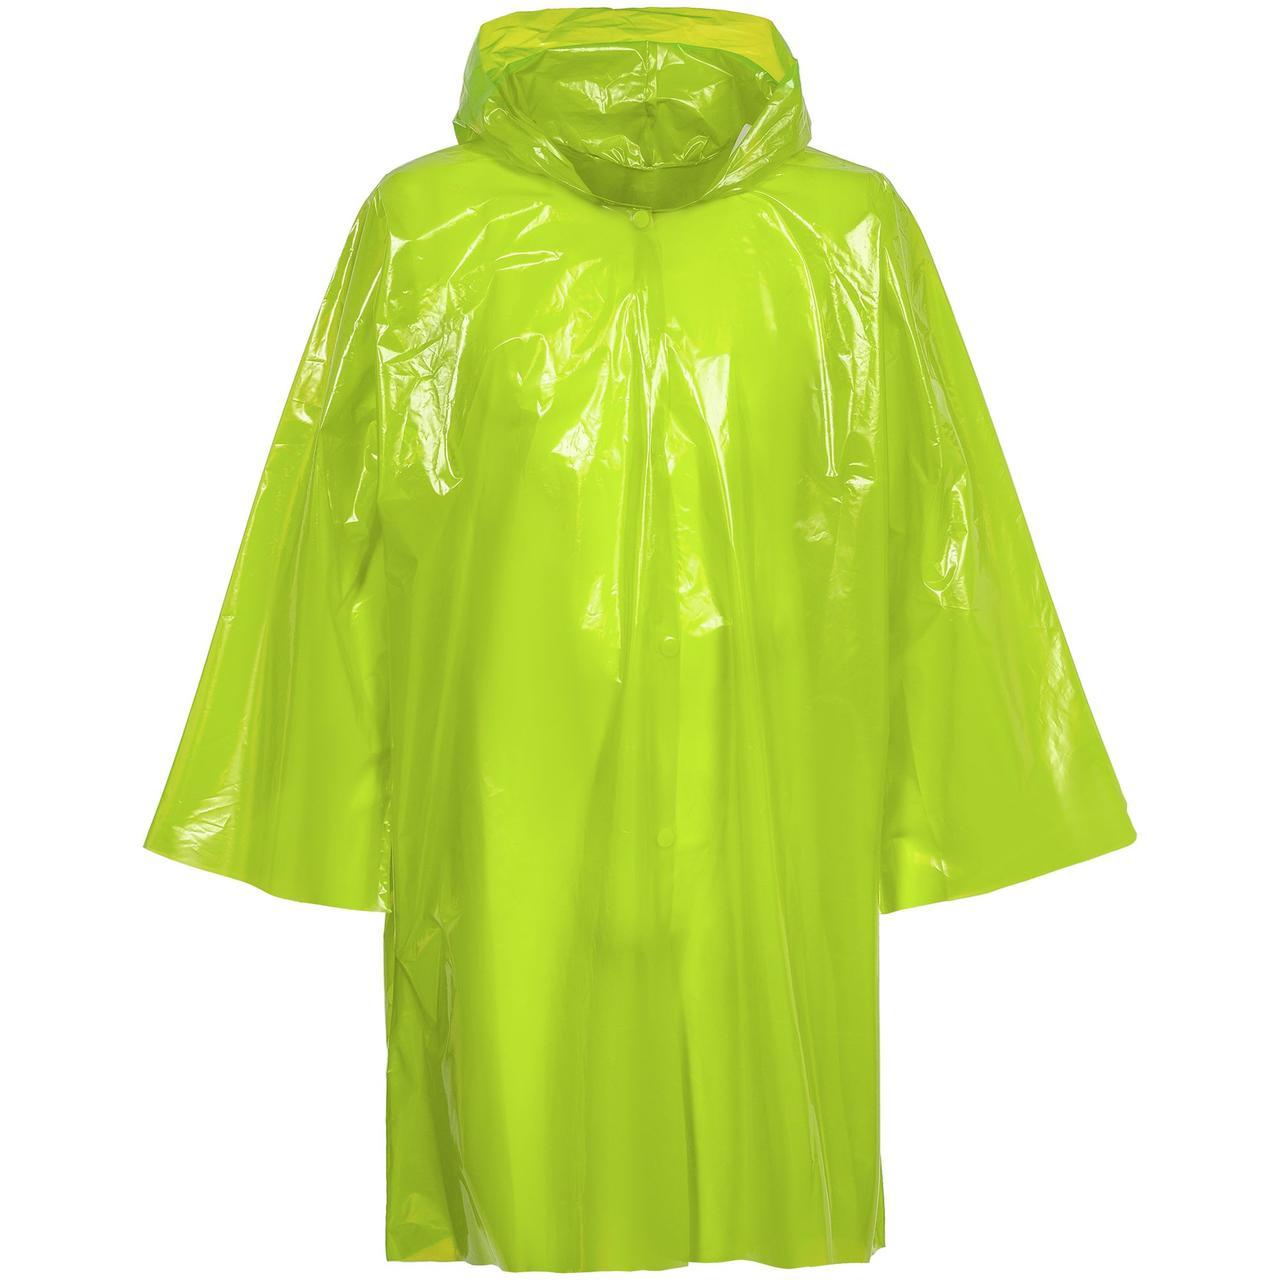 Дождевик-плащ CloudTime, зеленое яблоко (артикул 11876.94)